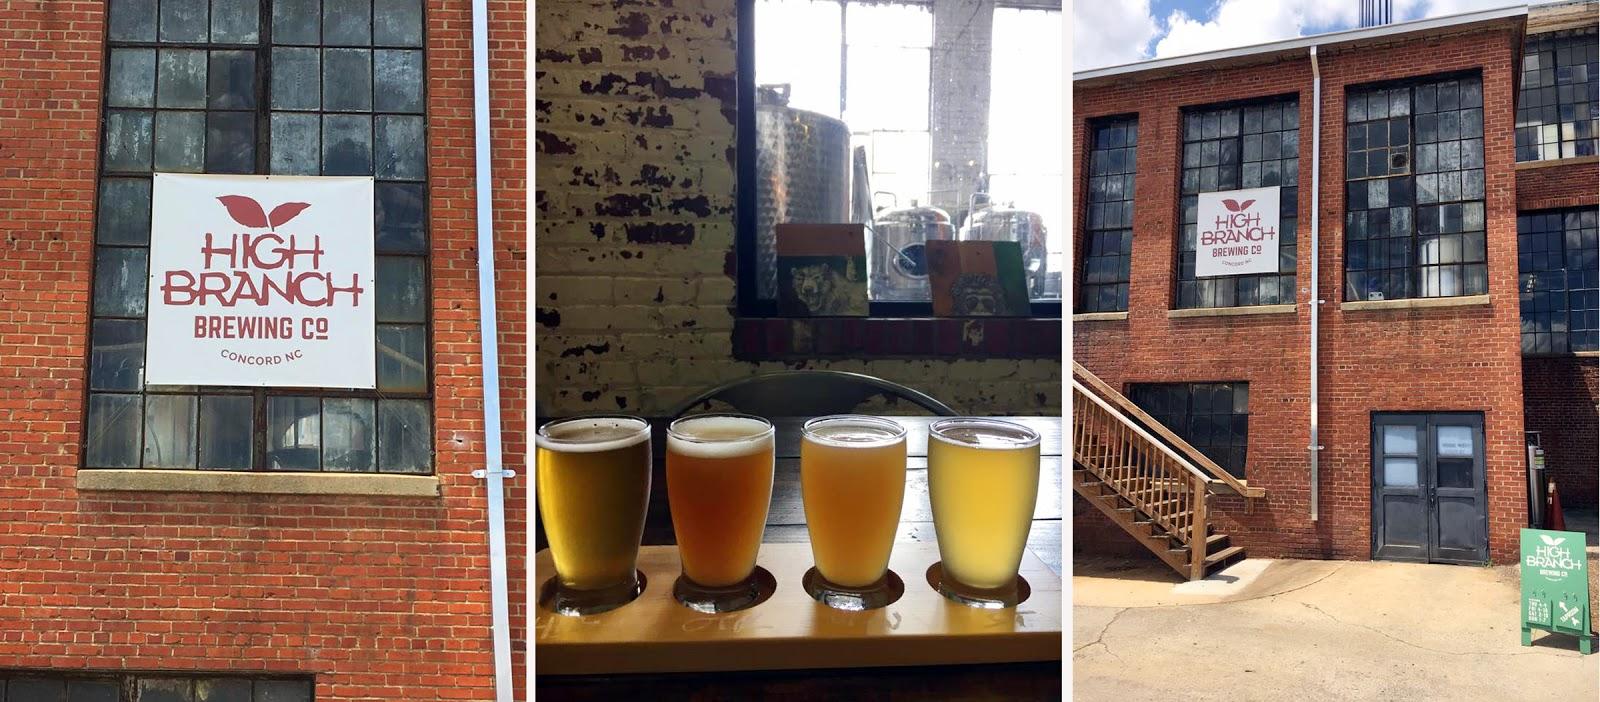 High Branch Brewing Company Concord North Carolina.jpg